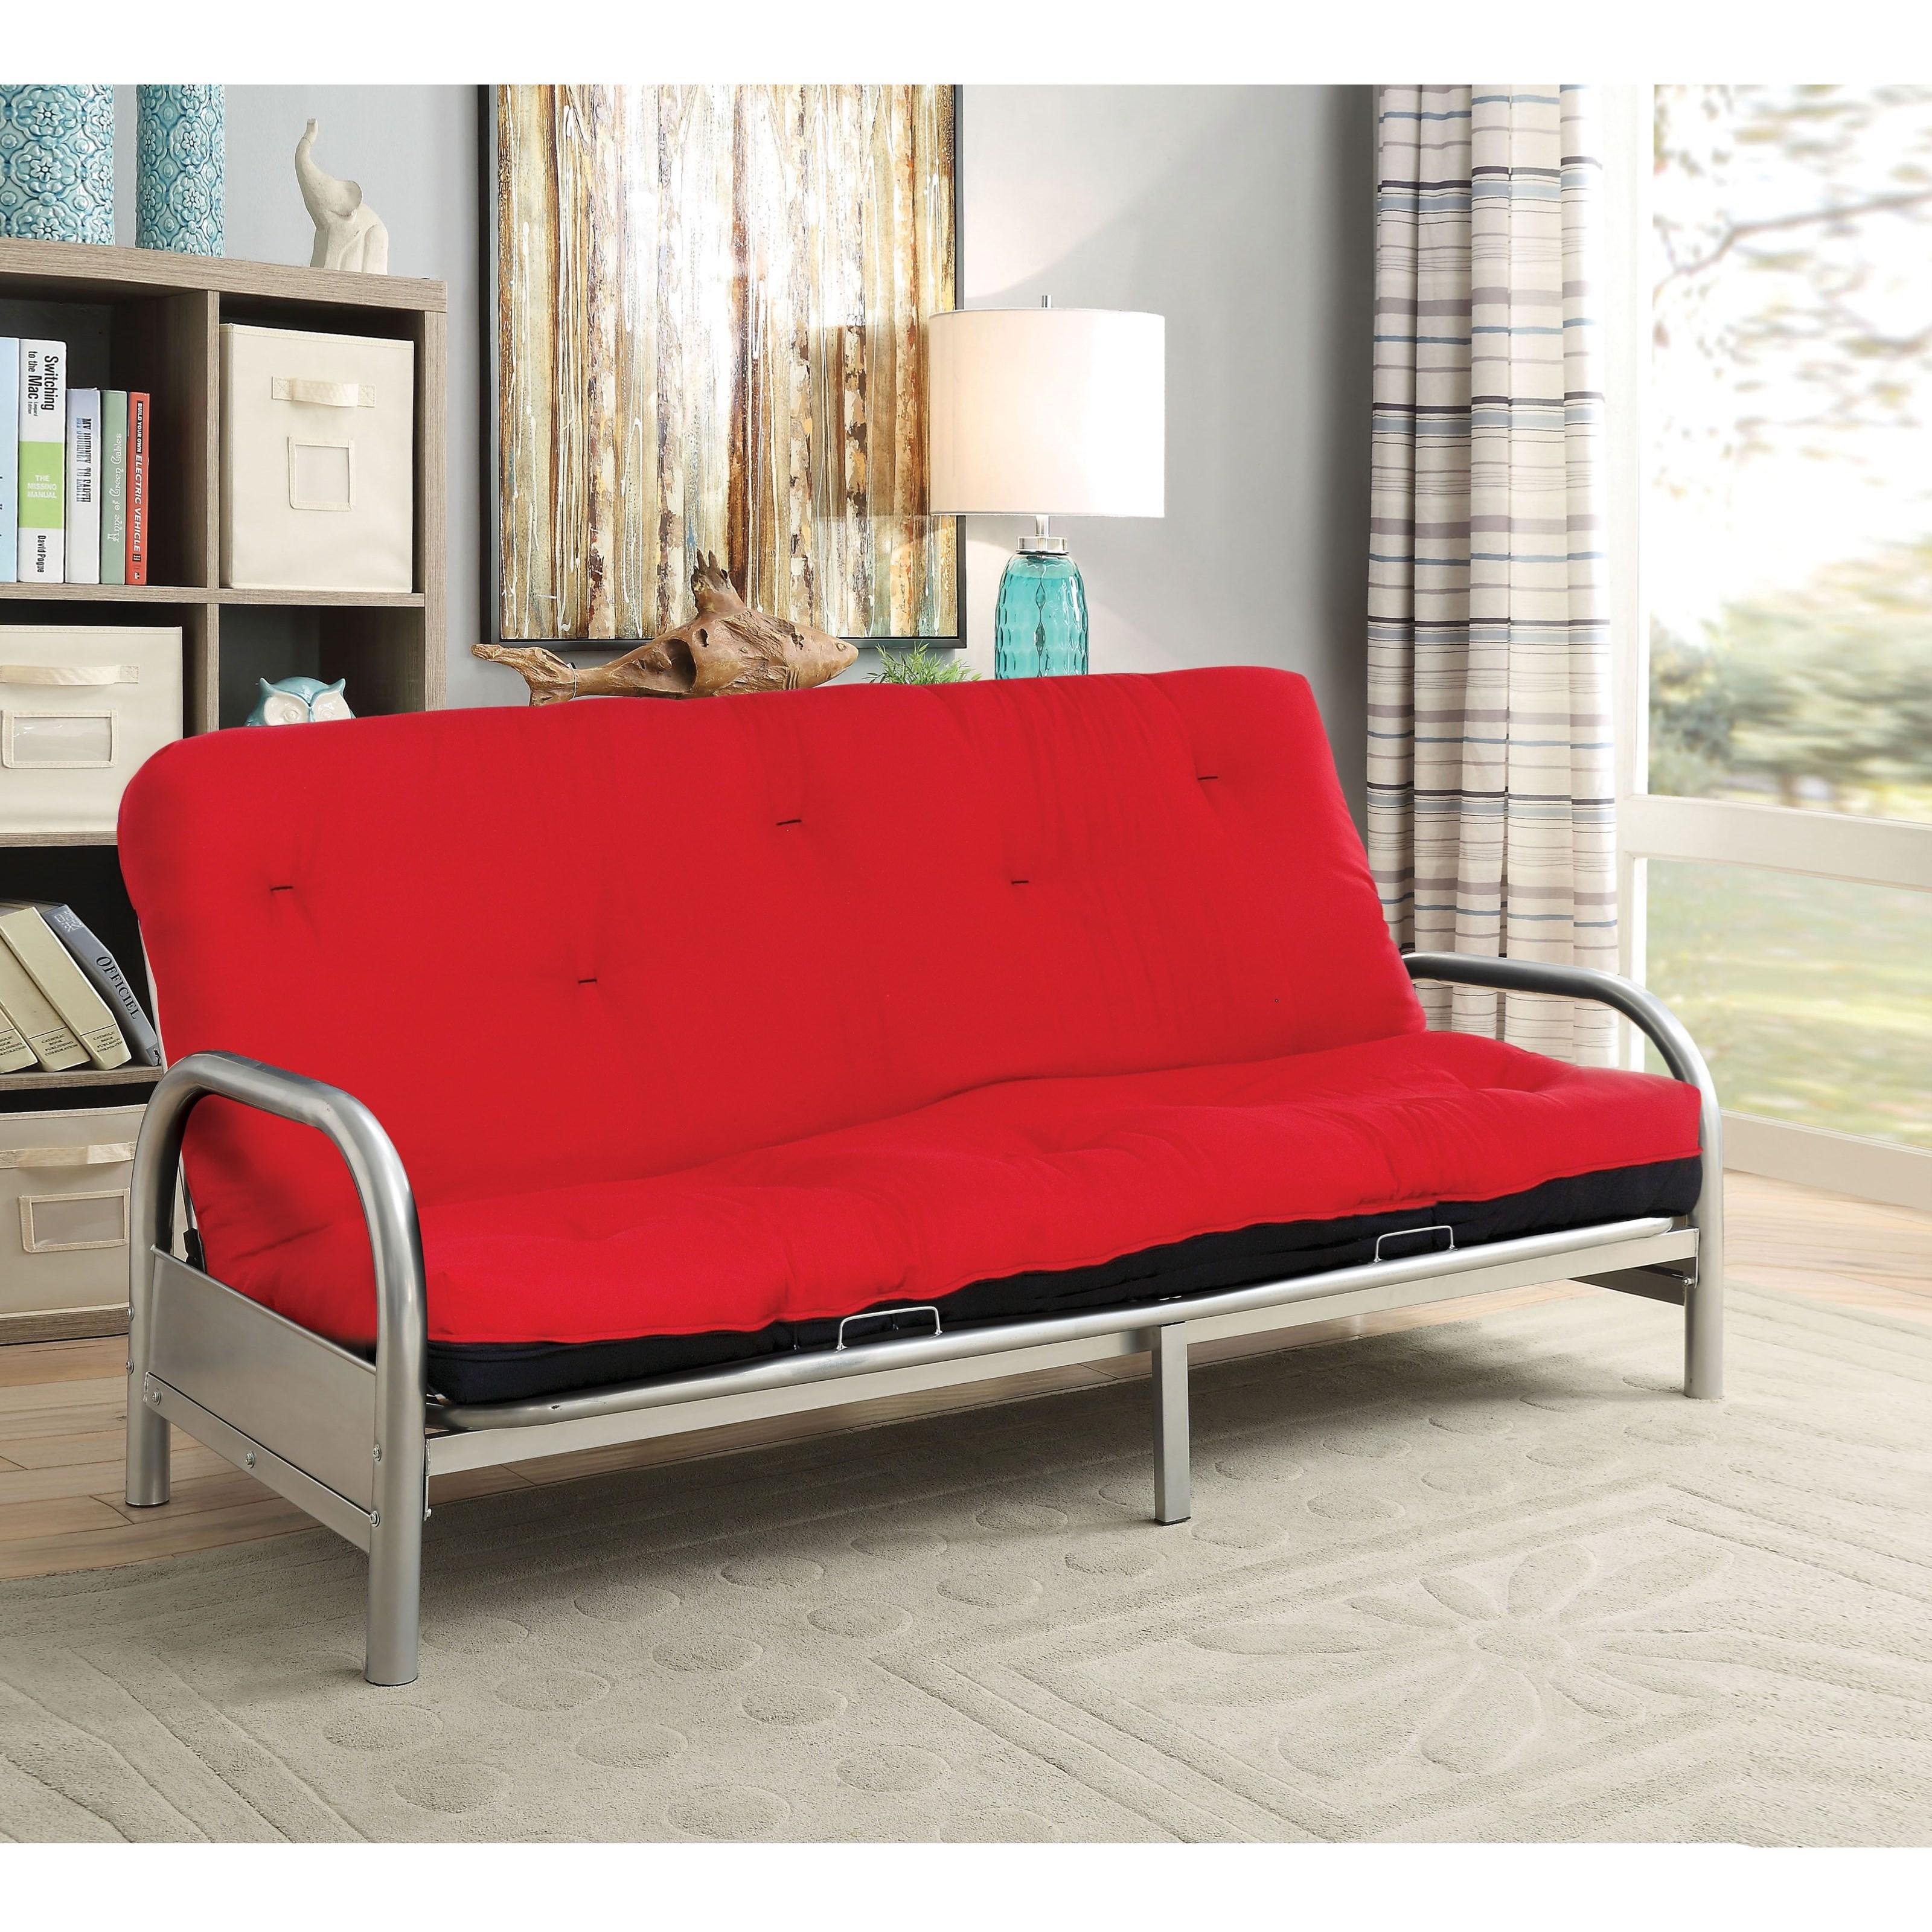 Alfonso Adjustable Sofa Frame by Acme Furniture at Carolina Direct